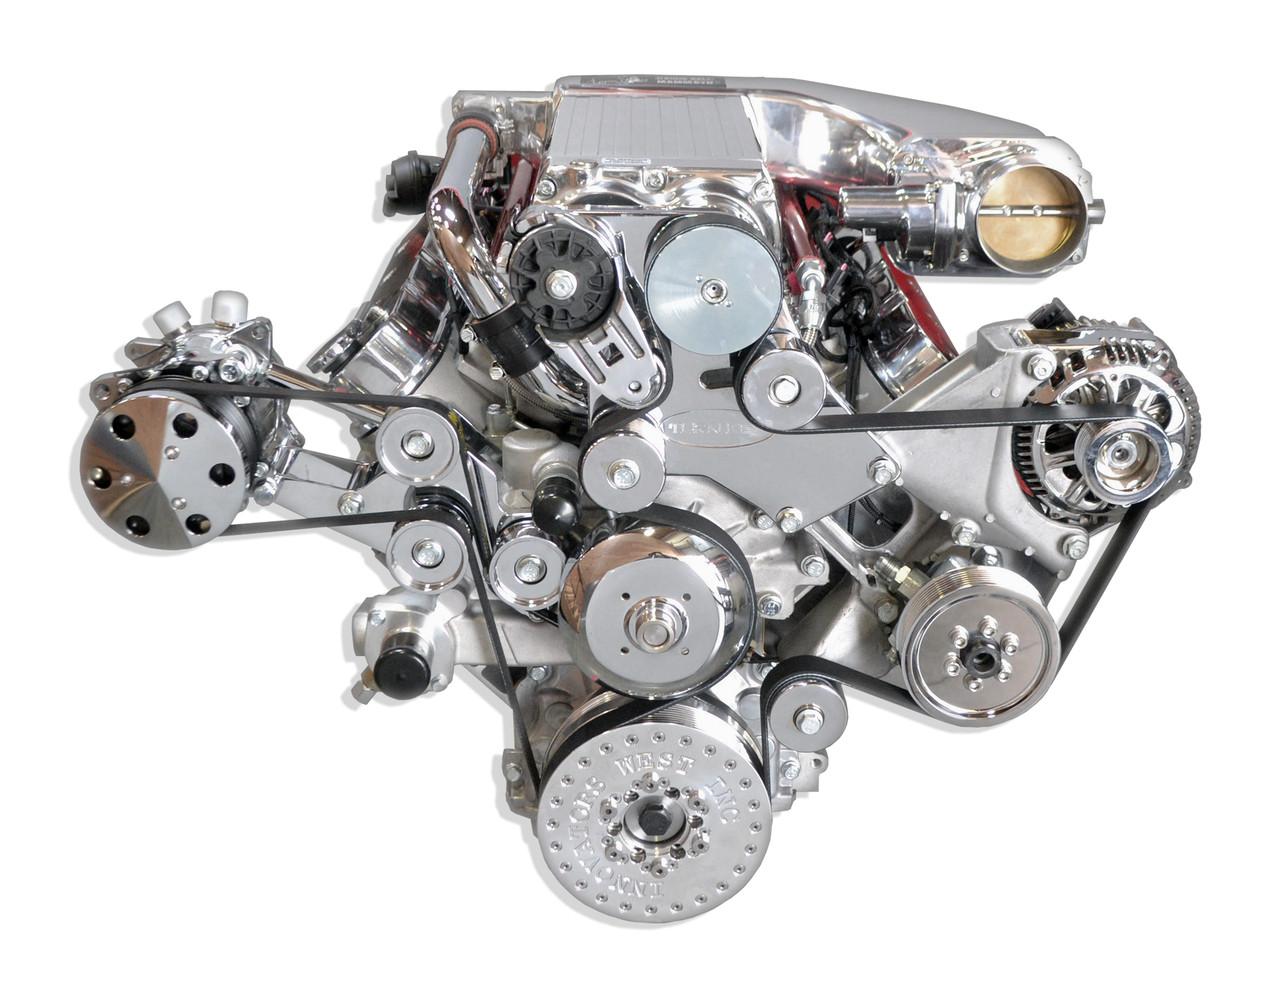 Turn Key Engine 887003 LS7 7 0L 820 HP Turn Key Supercharged Assembly -  Street